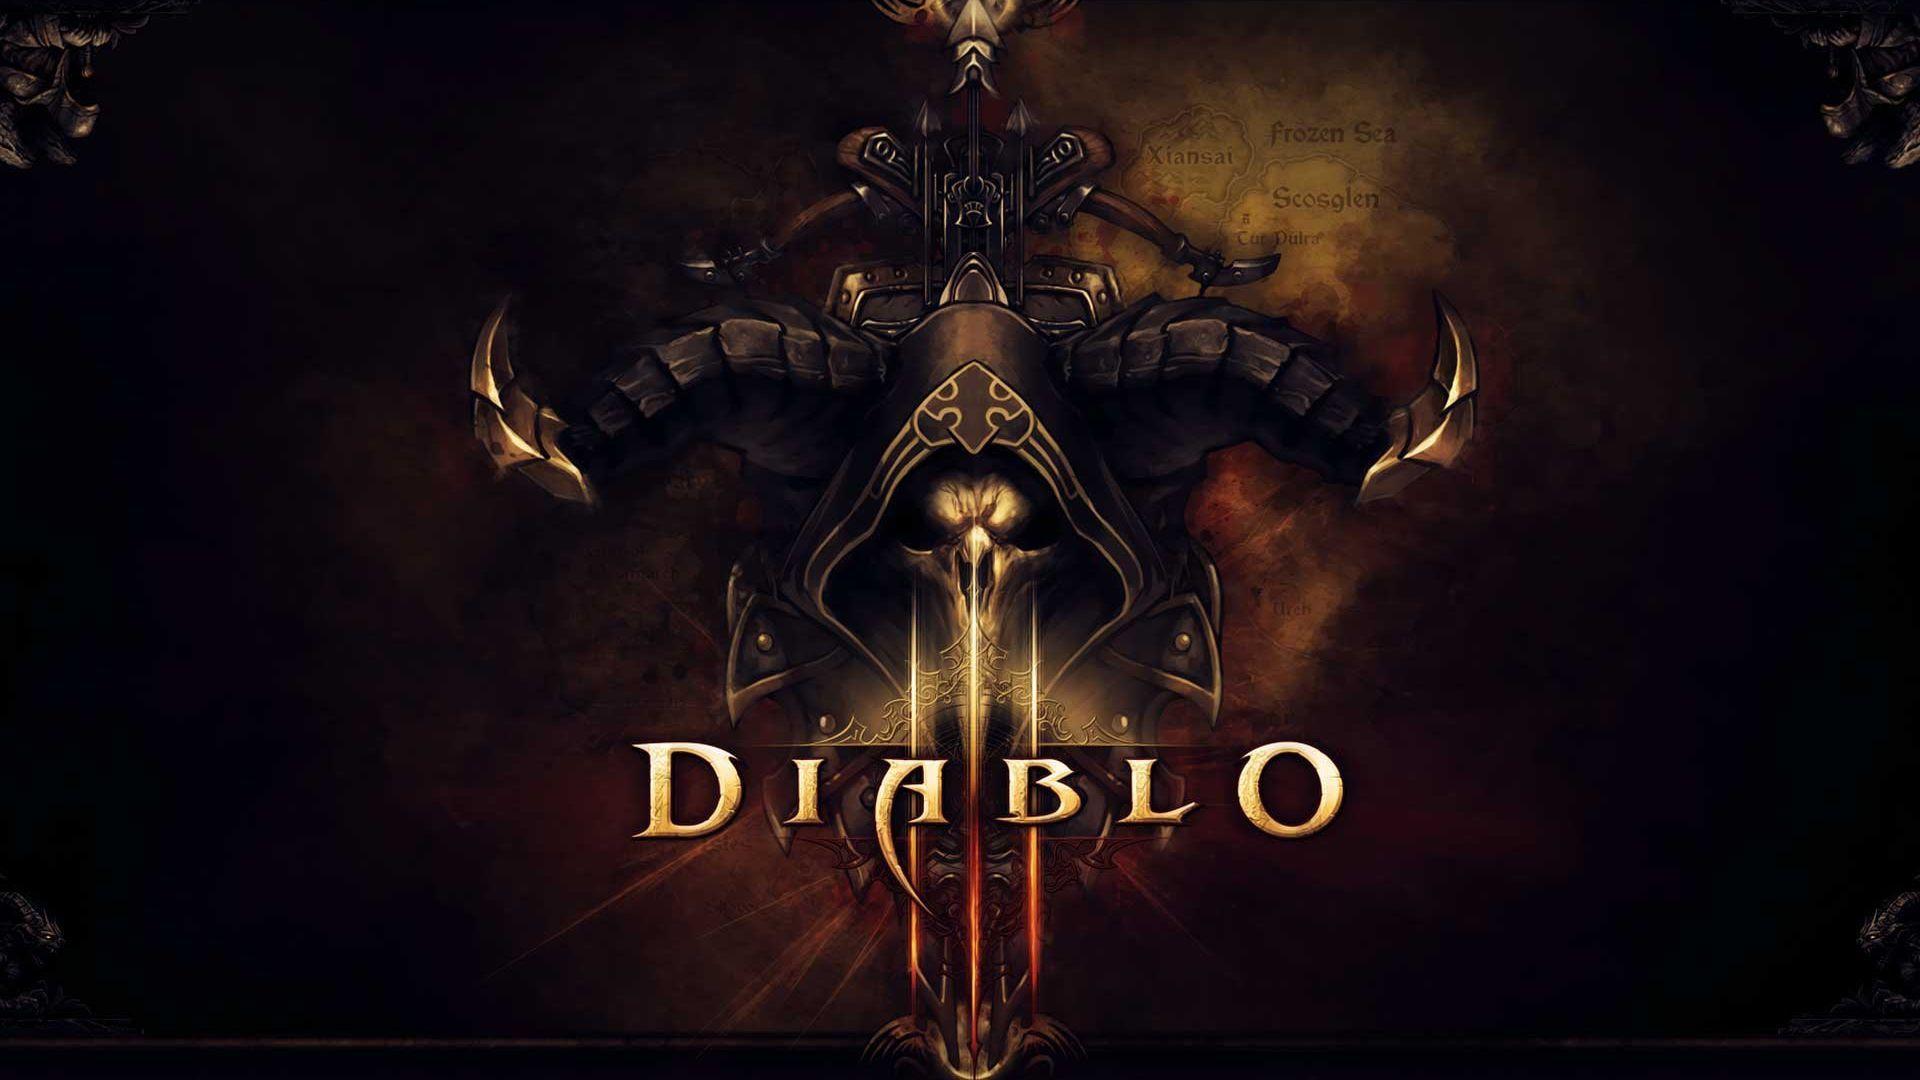 Diablo Iii Demon Hunter Artwork Hd Wallpaper Fullhdwpp Full Hd Wallpapers 1920x1080 Diablo Demon Hunter Diablo Game Diablo